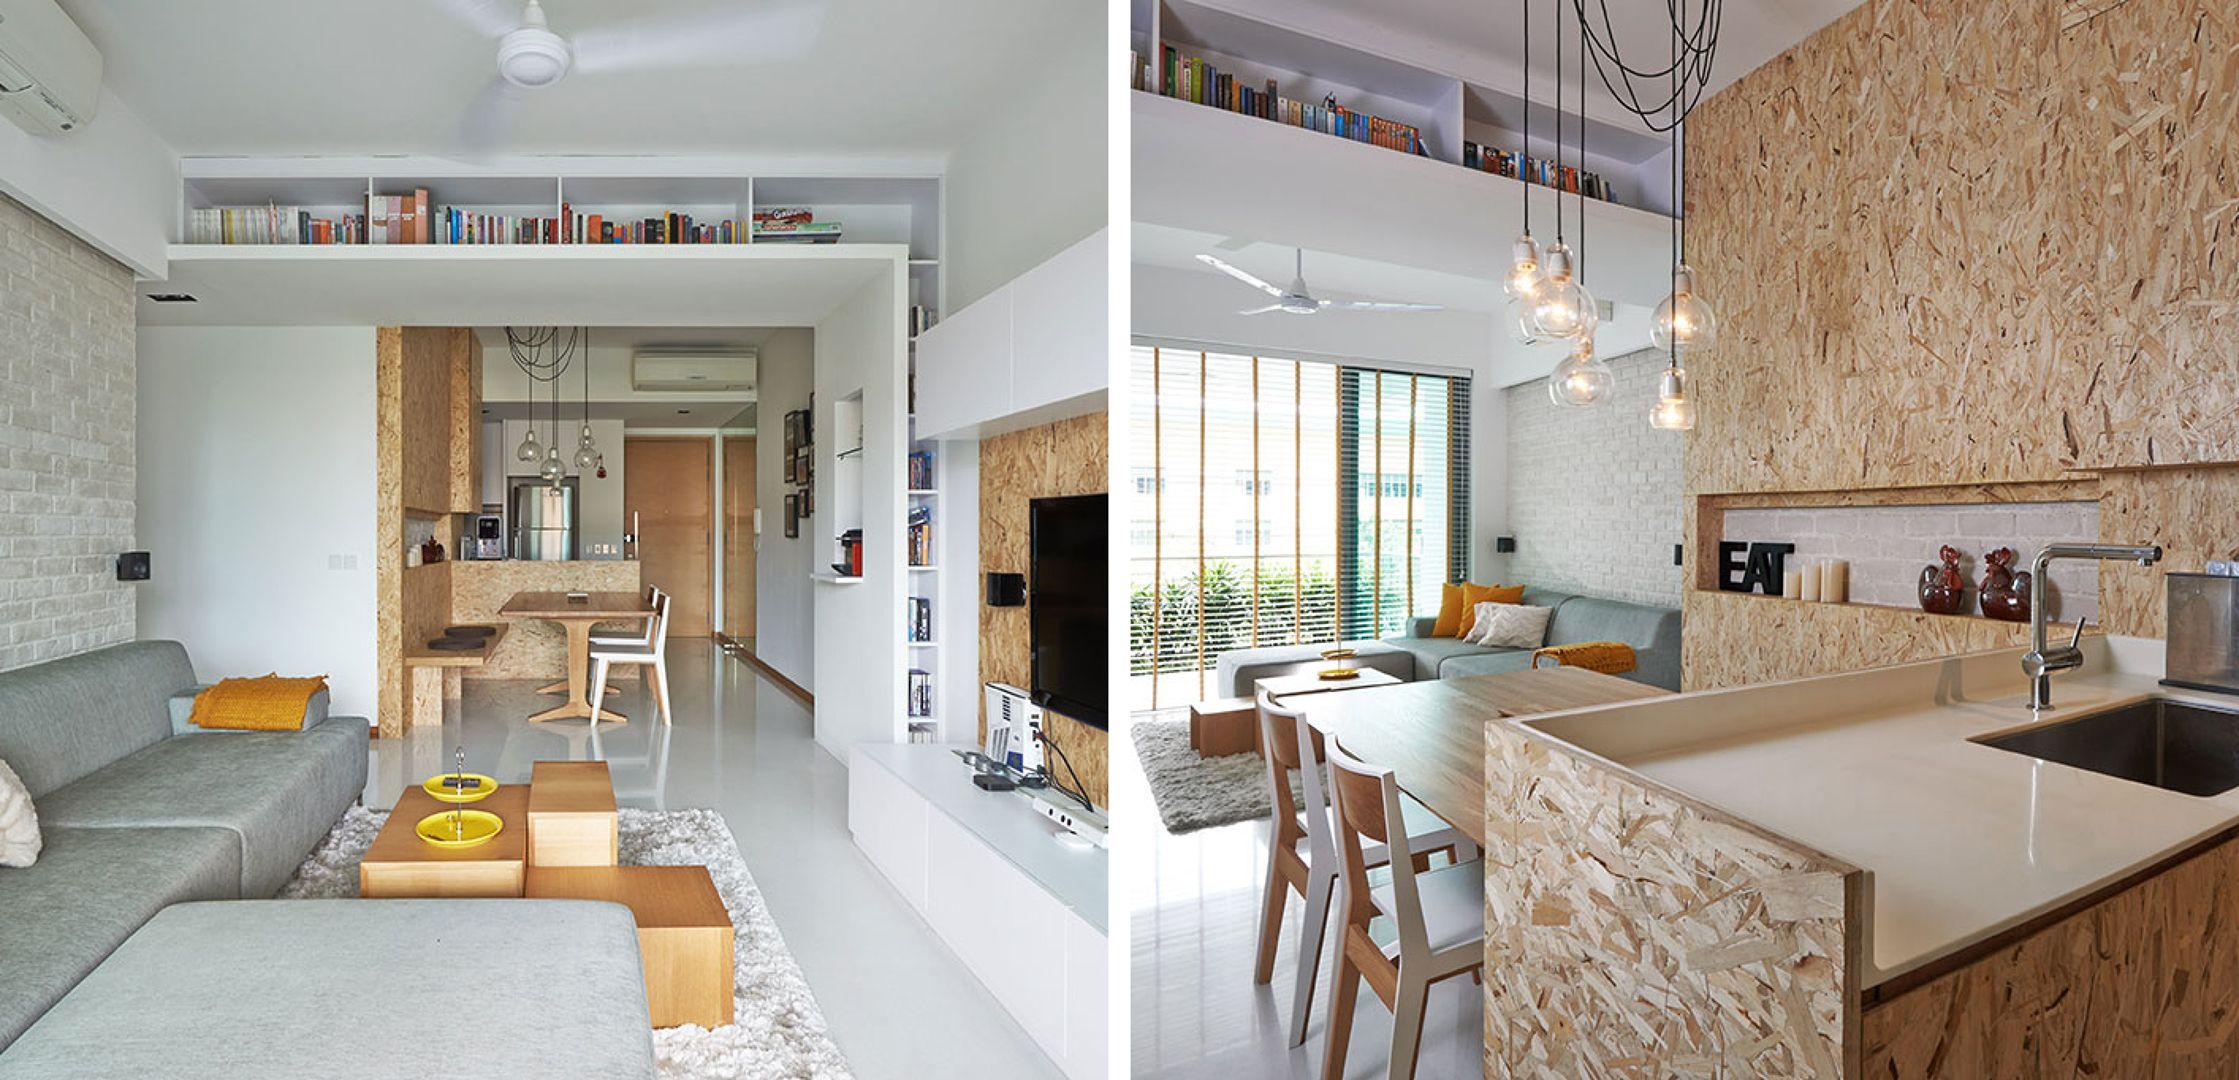 costruire una cucina con pannelli osb